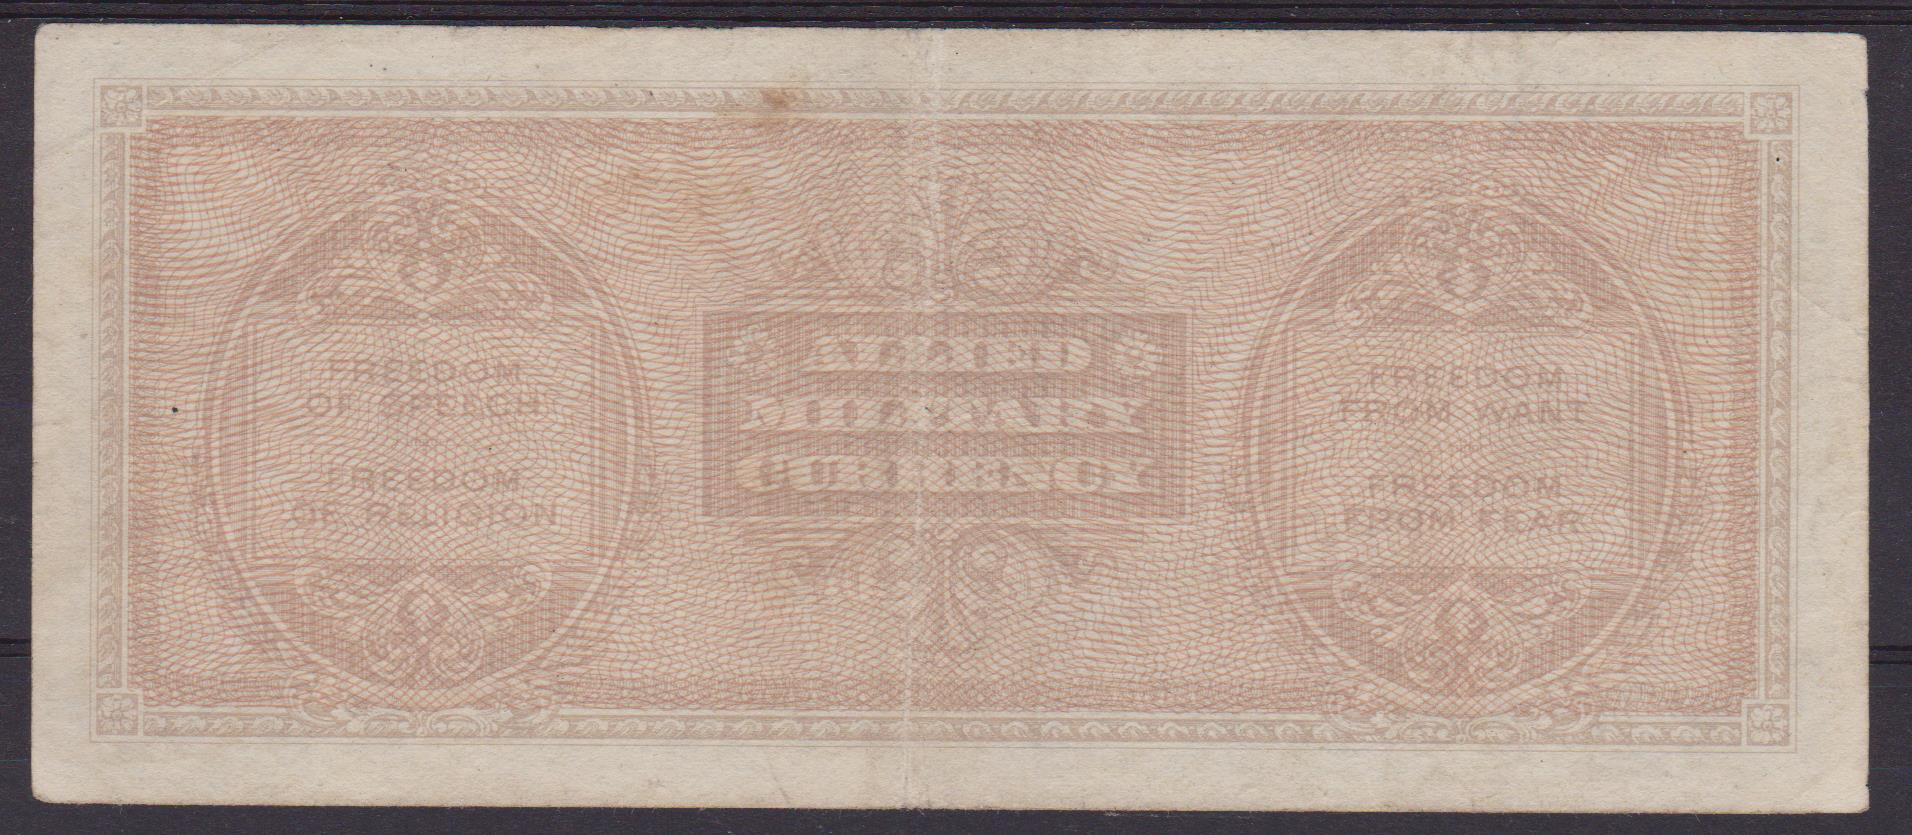 banconota bilingue 1000 lire 2 001